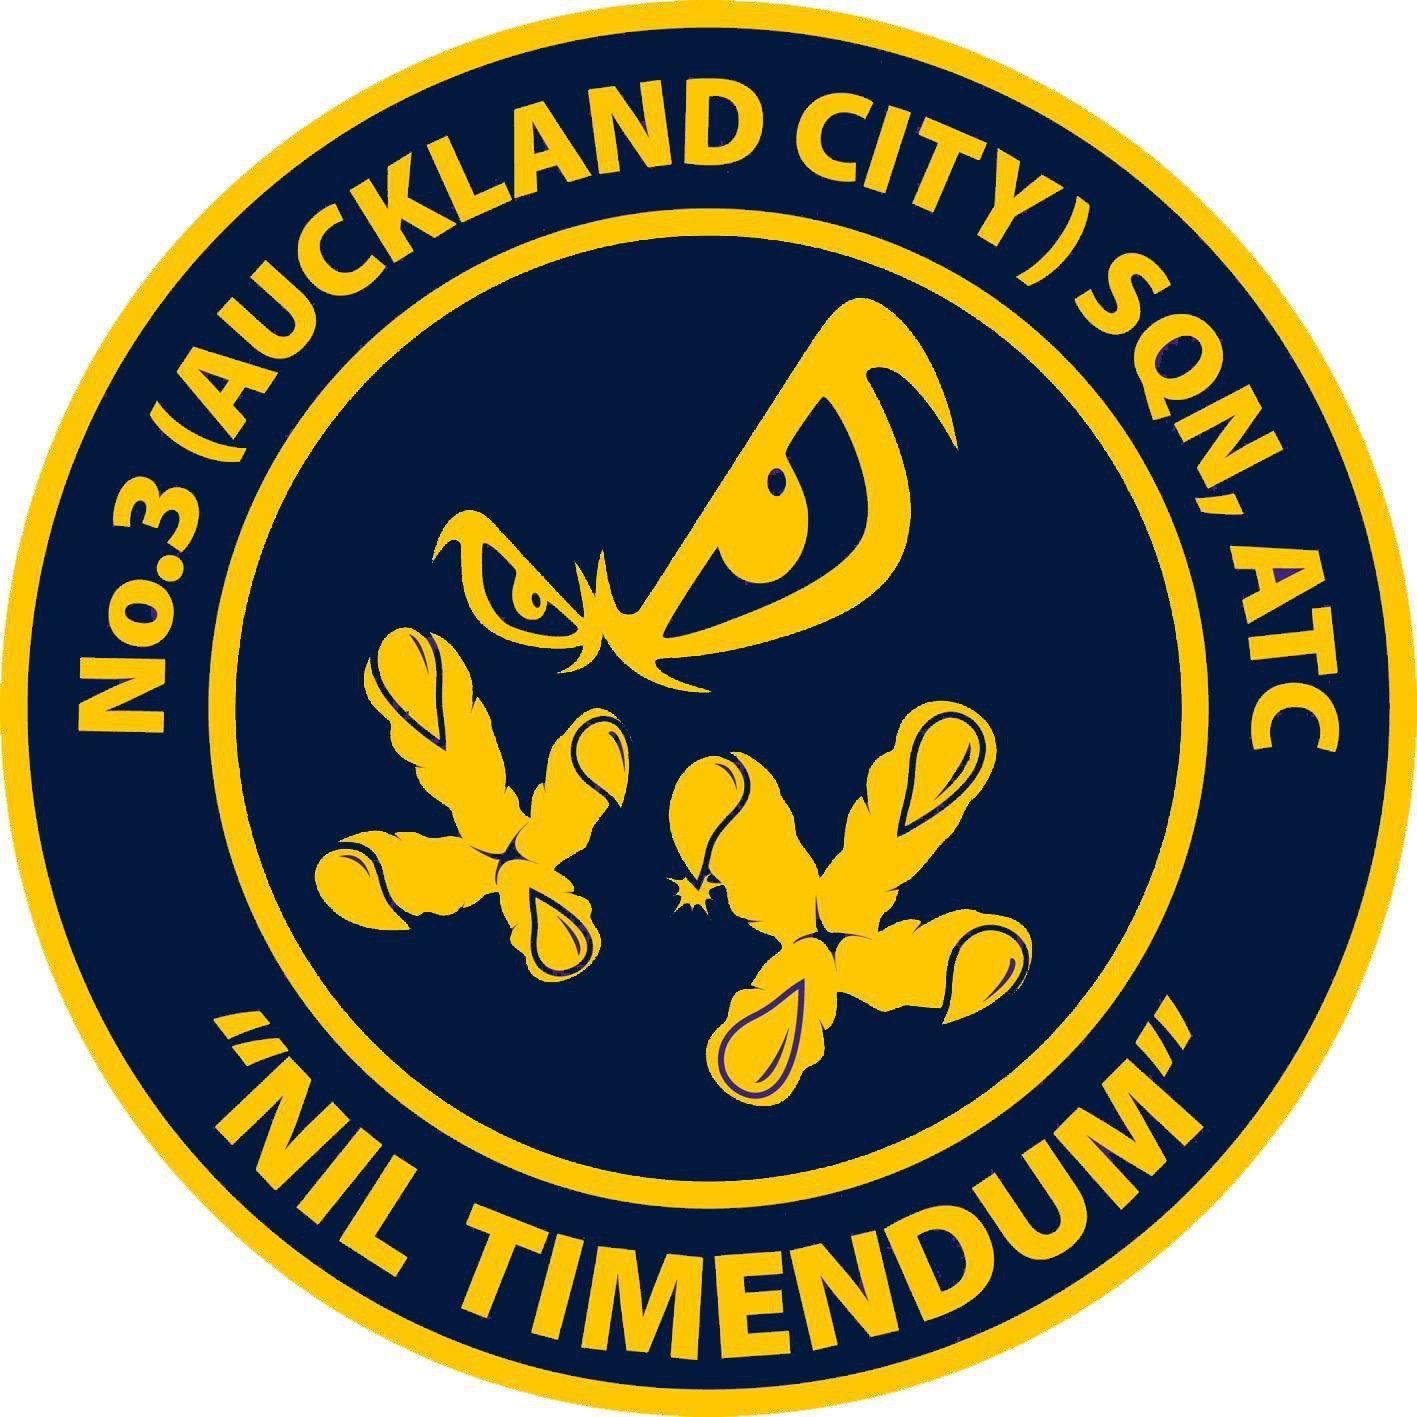 No. 3 (Auckland City) Squadron